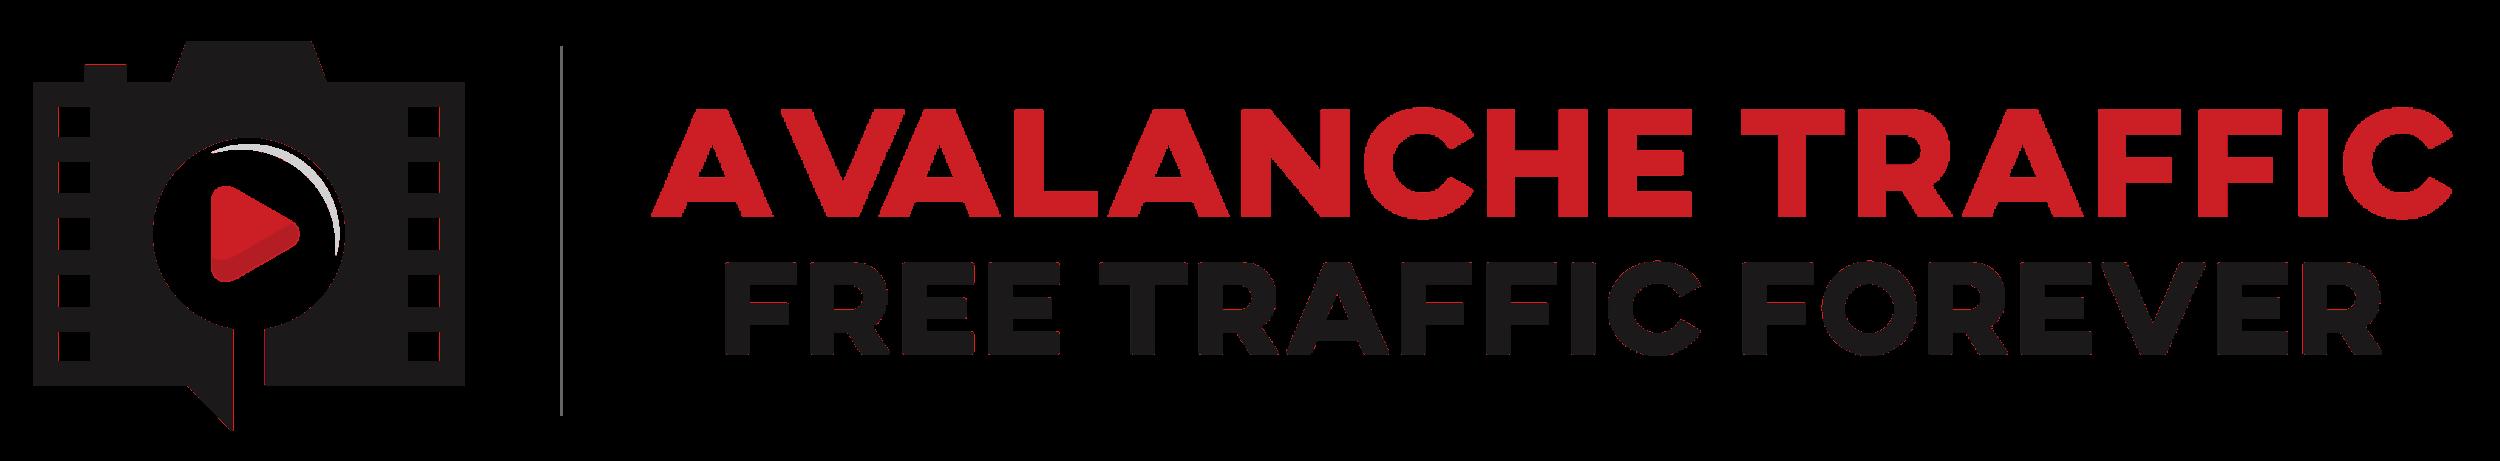 avalanche traffic horizontal